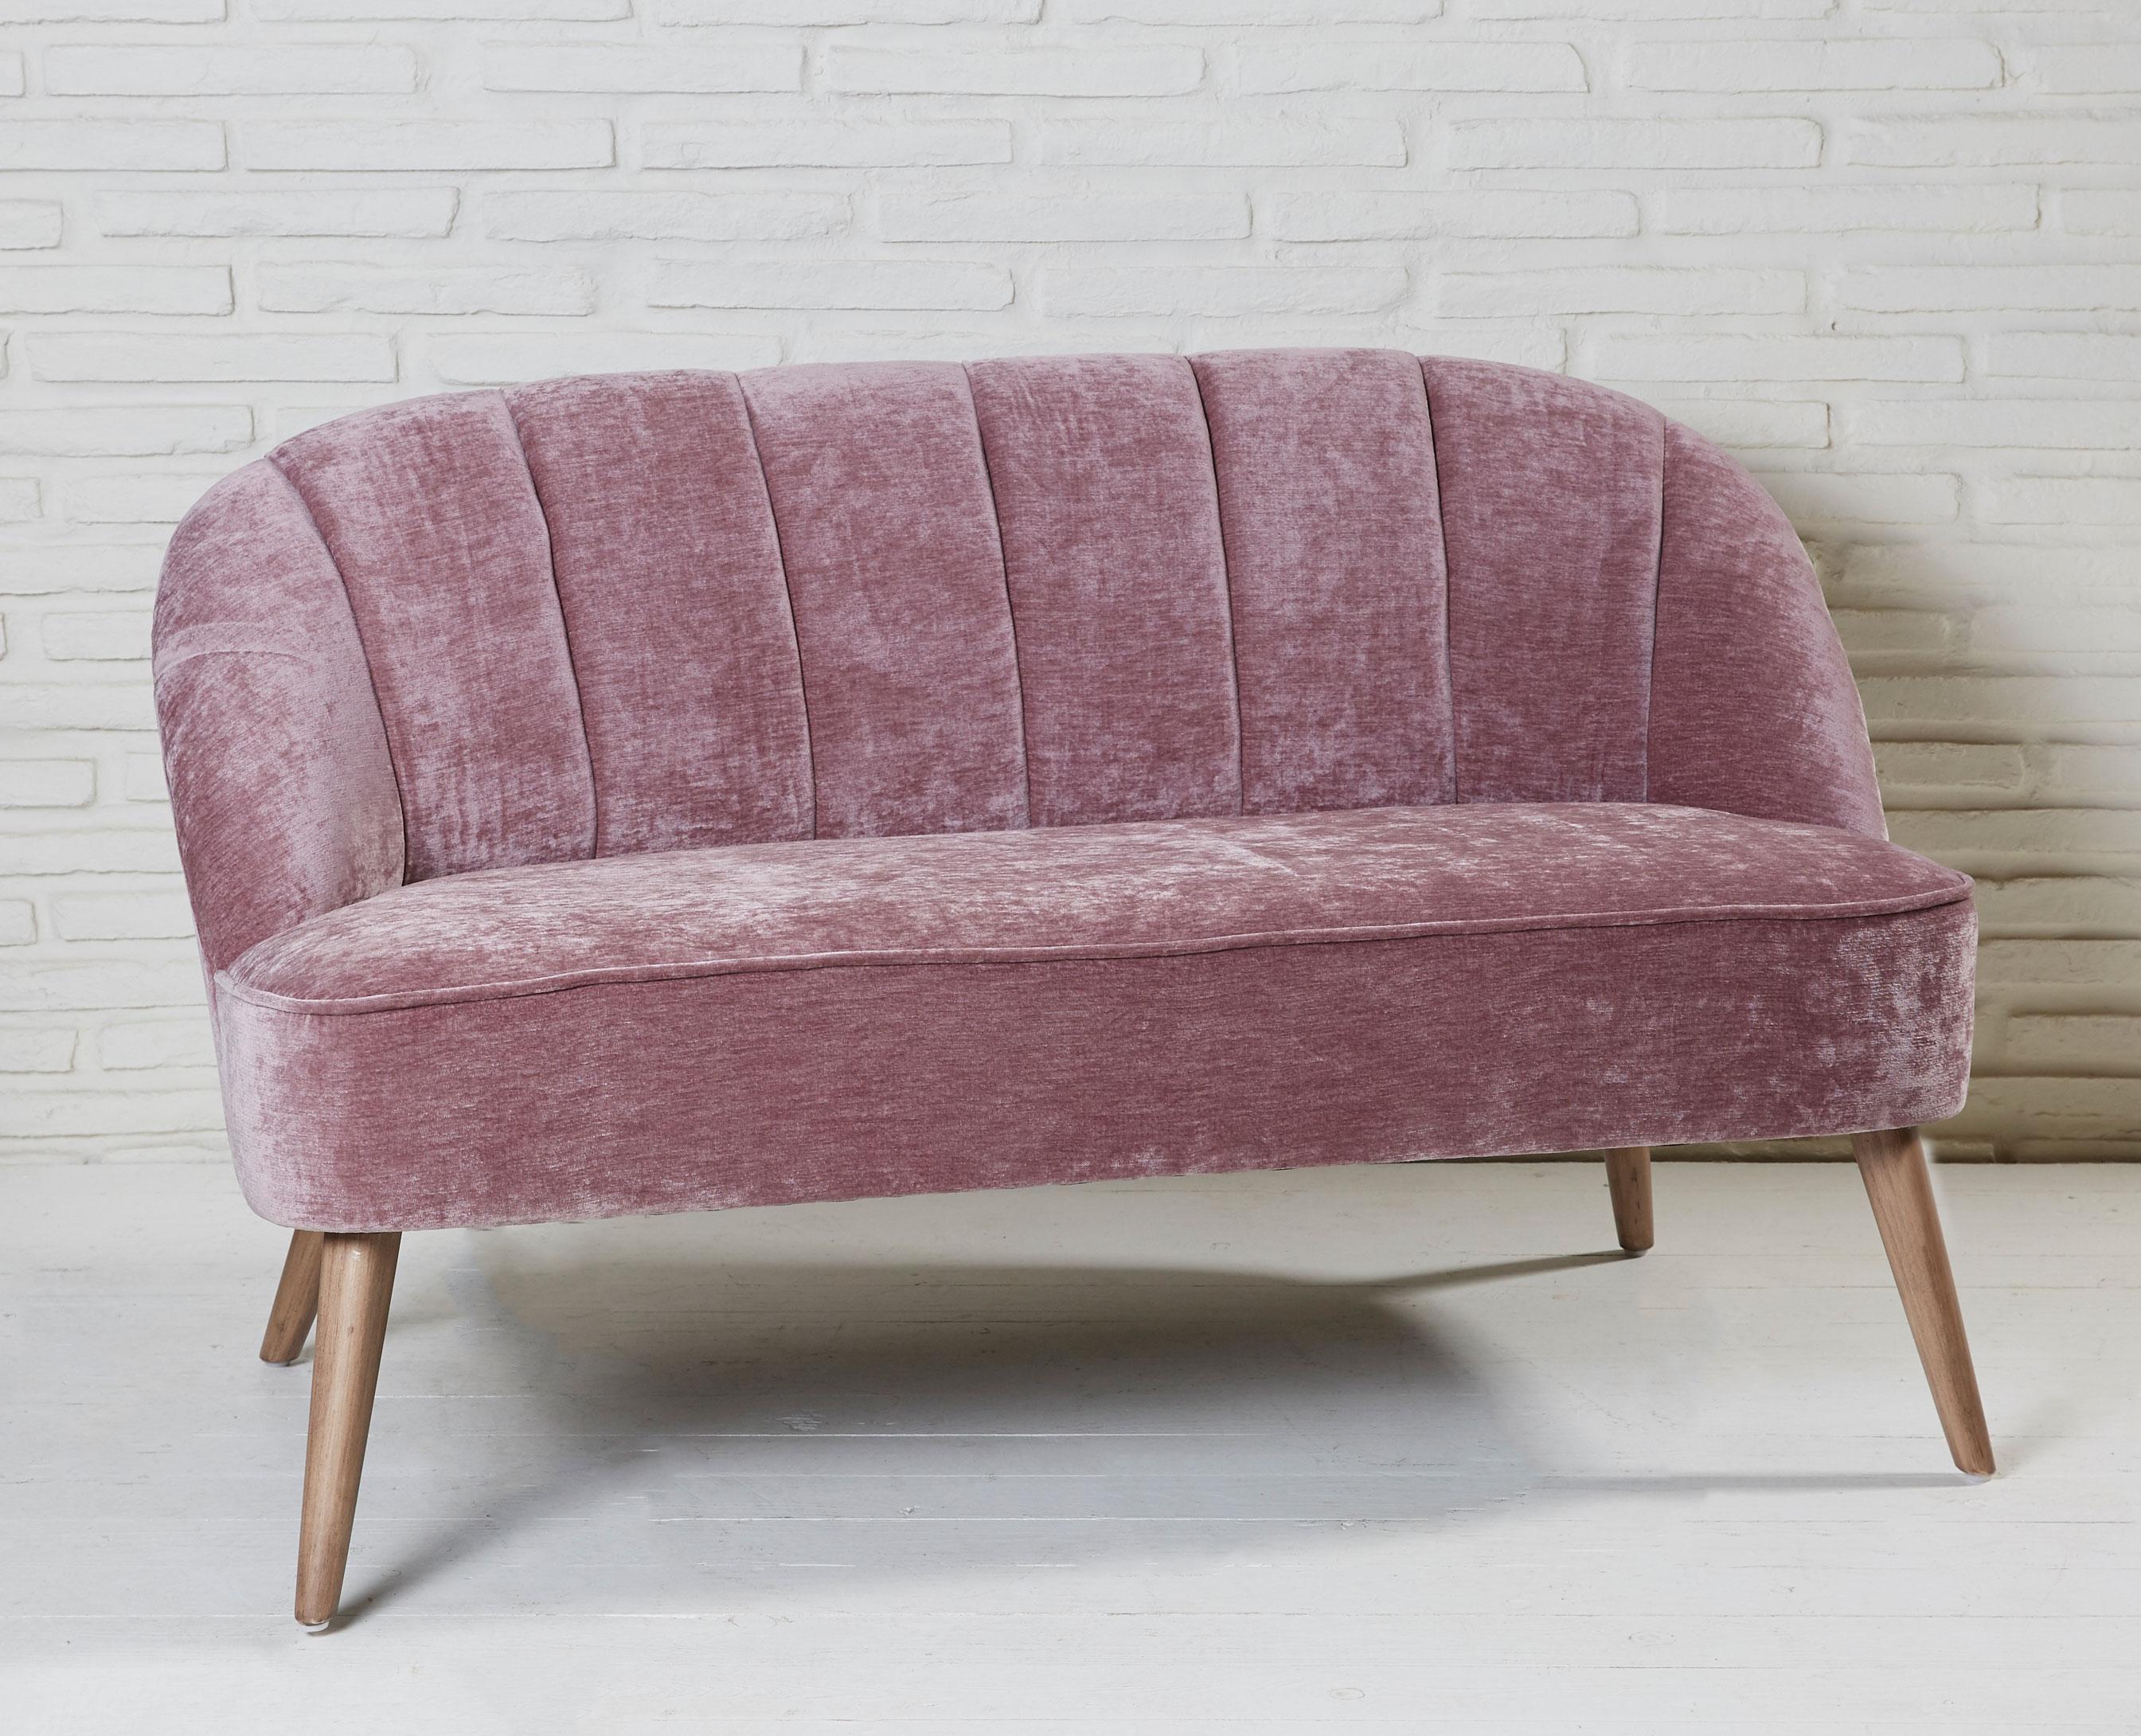 sofa polstersofa houston aus holz und stoff mit samtbezug pink ebay. Black Bedroom Furniture Sets. Home Design Ideas